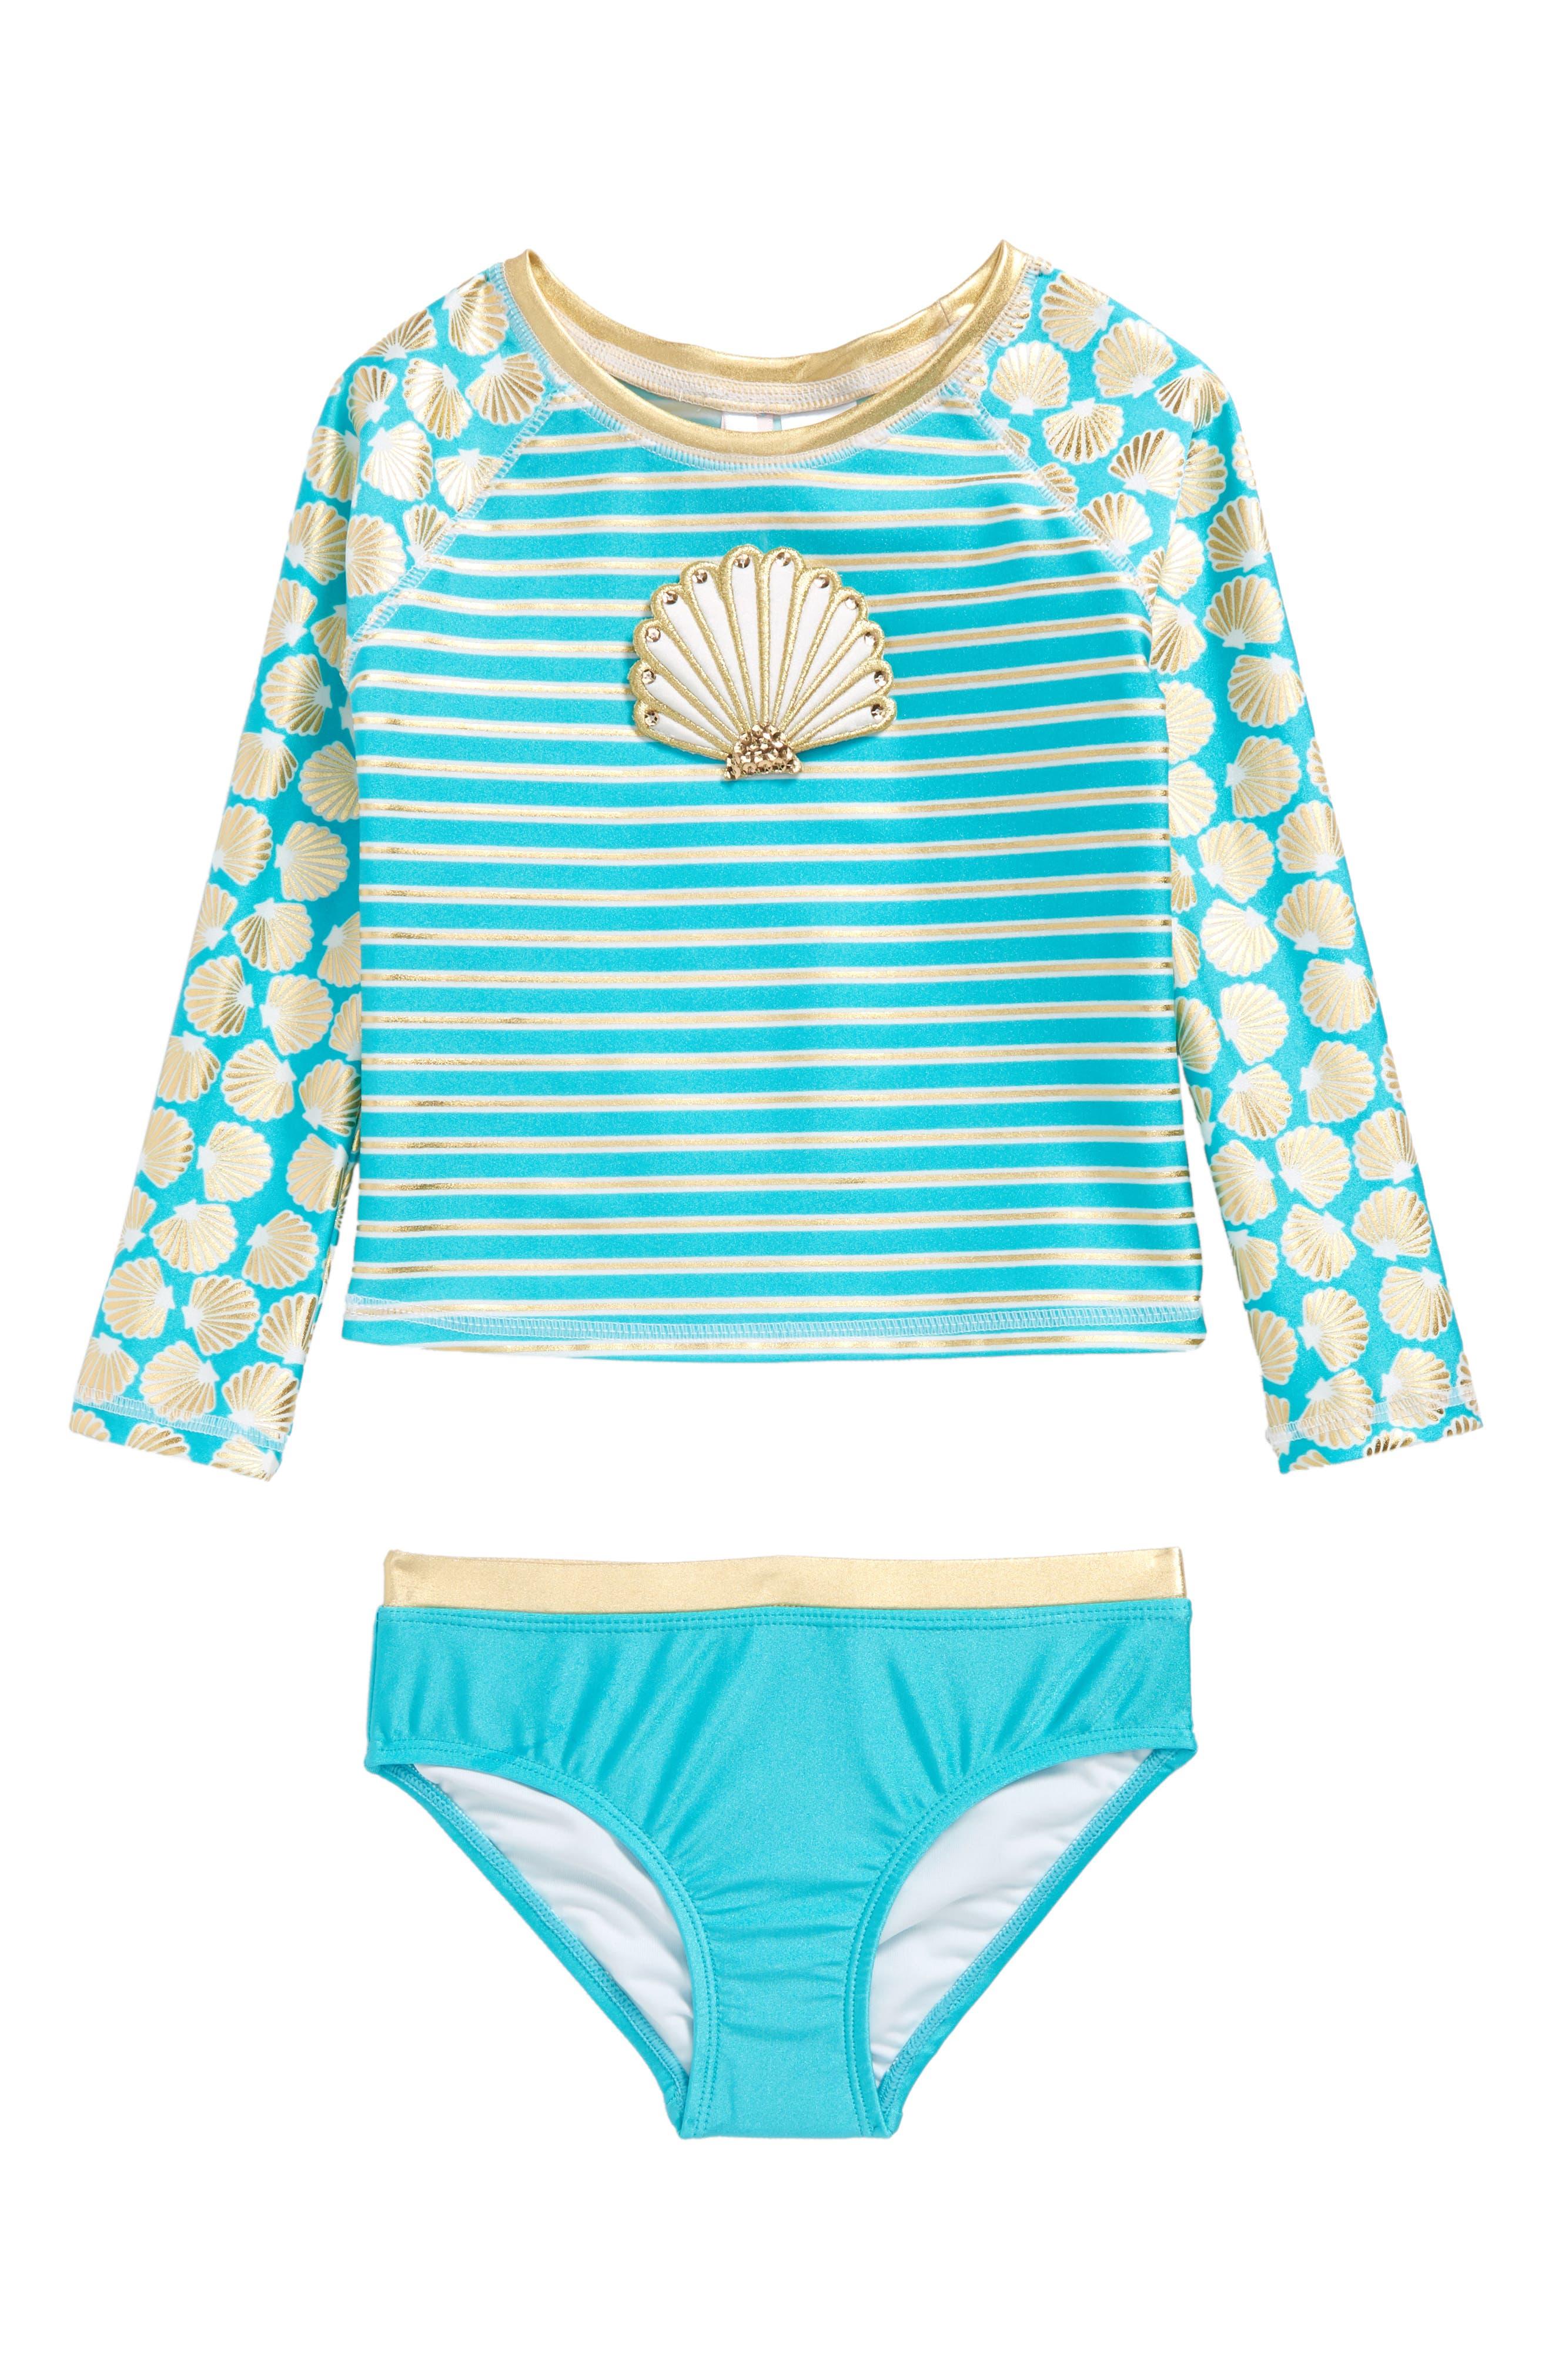 Main Image - Love U Lots Seashell Stripe Two-Piece Rashguard Swimsuit (Toddler Girls & Little Girls)